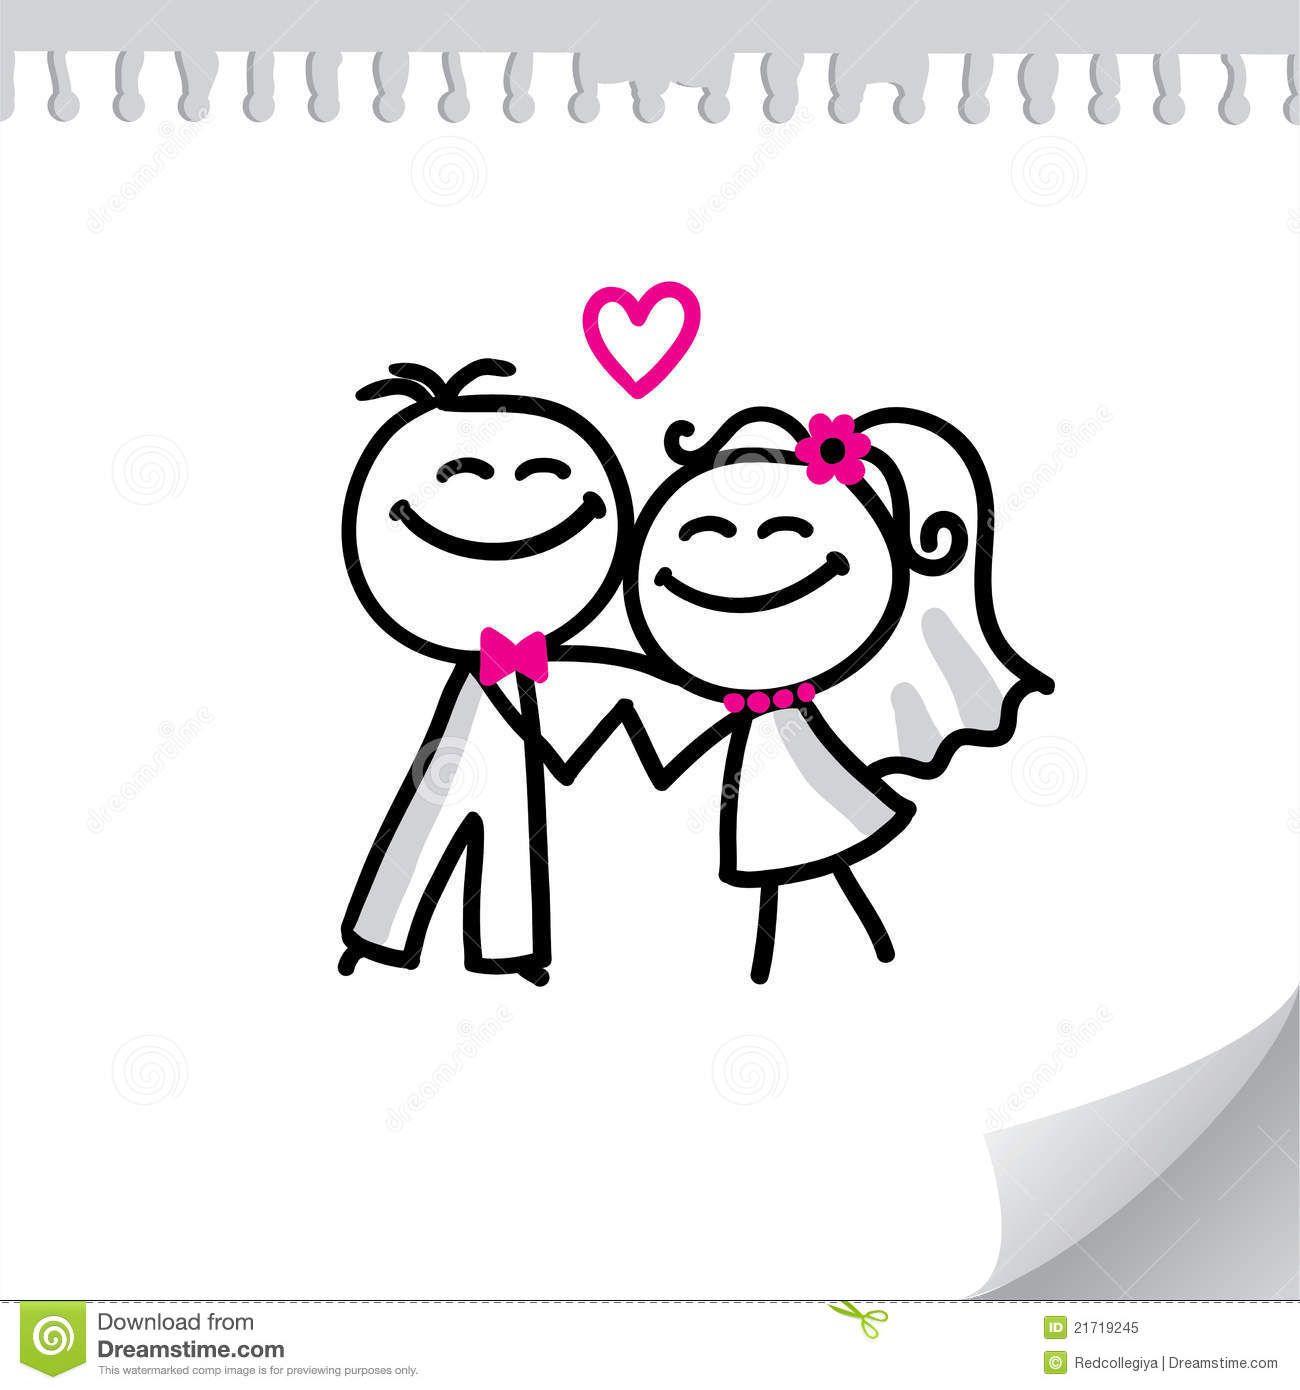 mariage dessin anim google search - Dessin Mariage